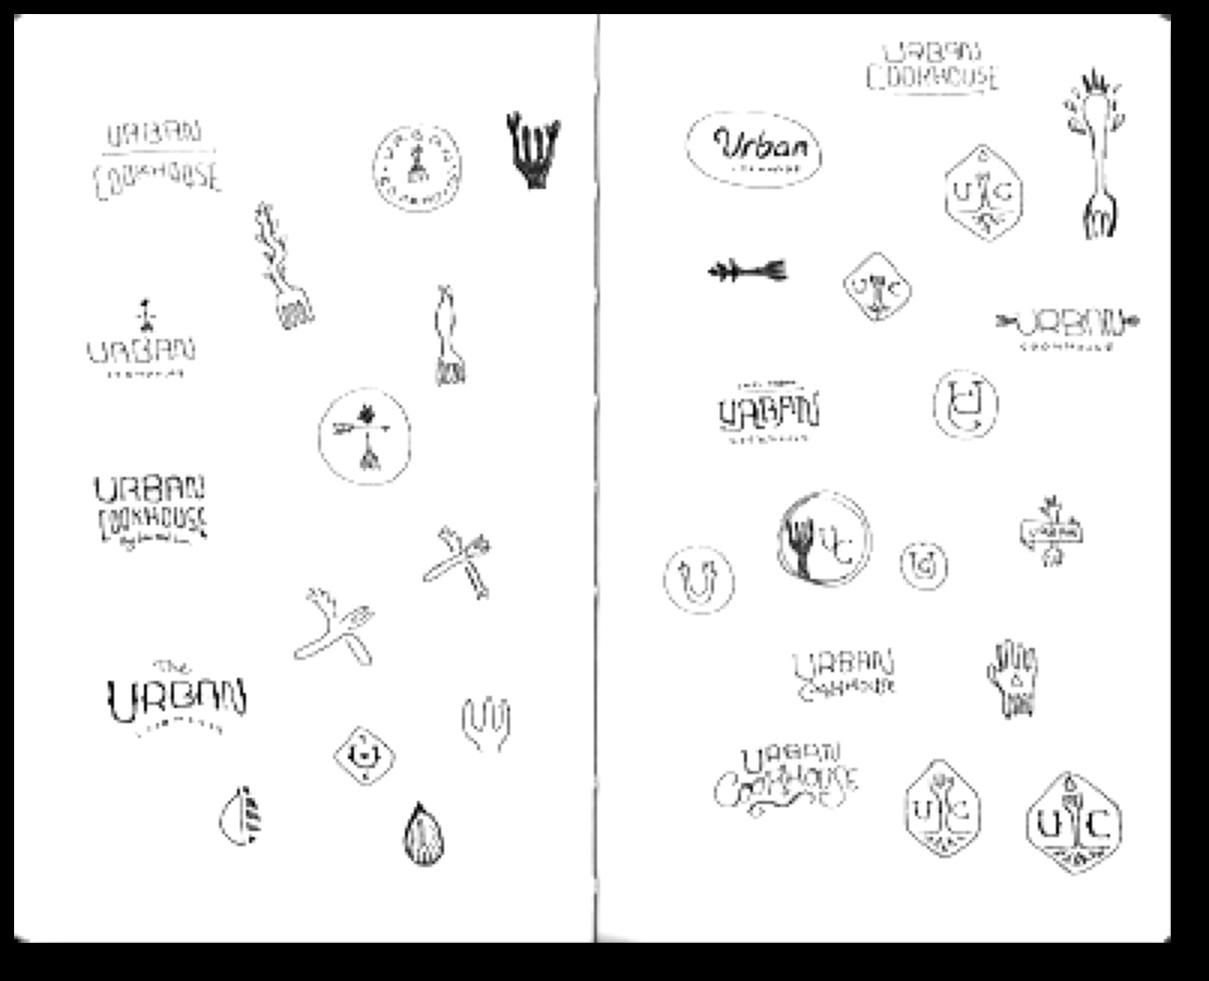 Telegraph's design process